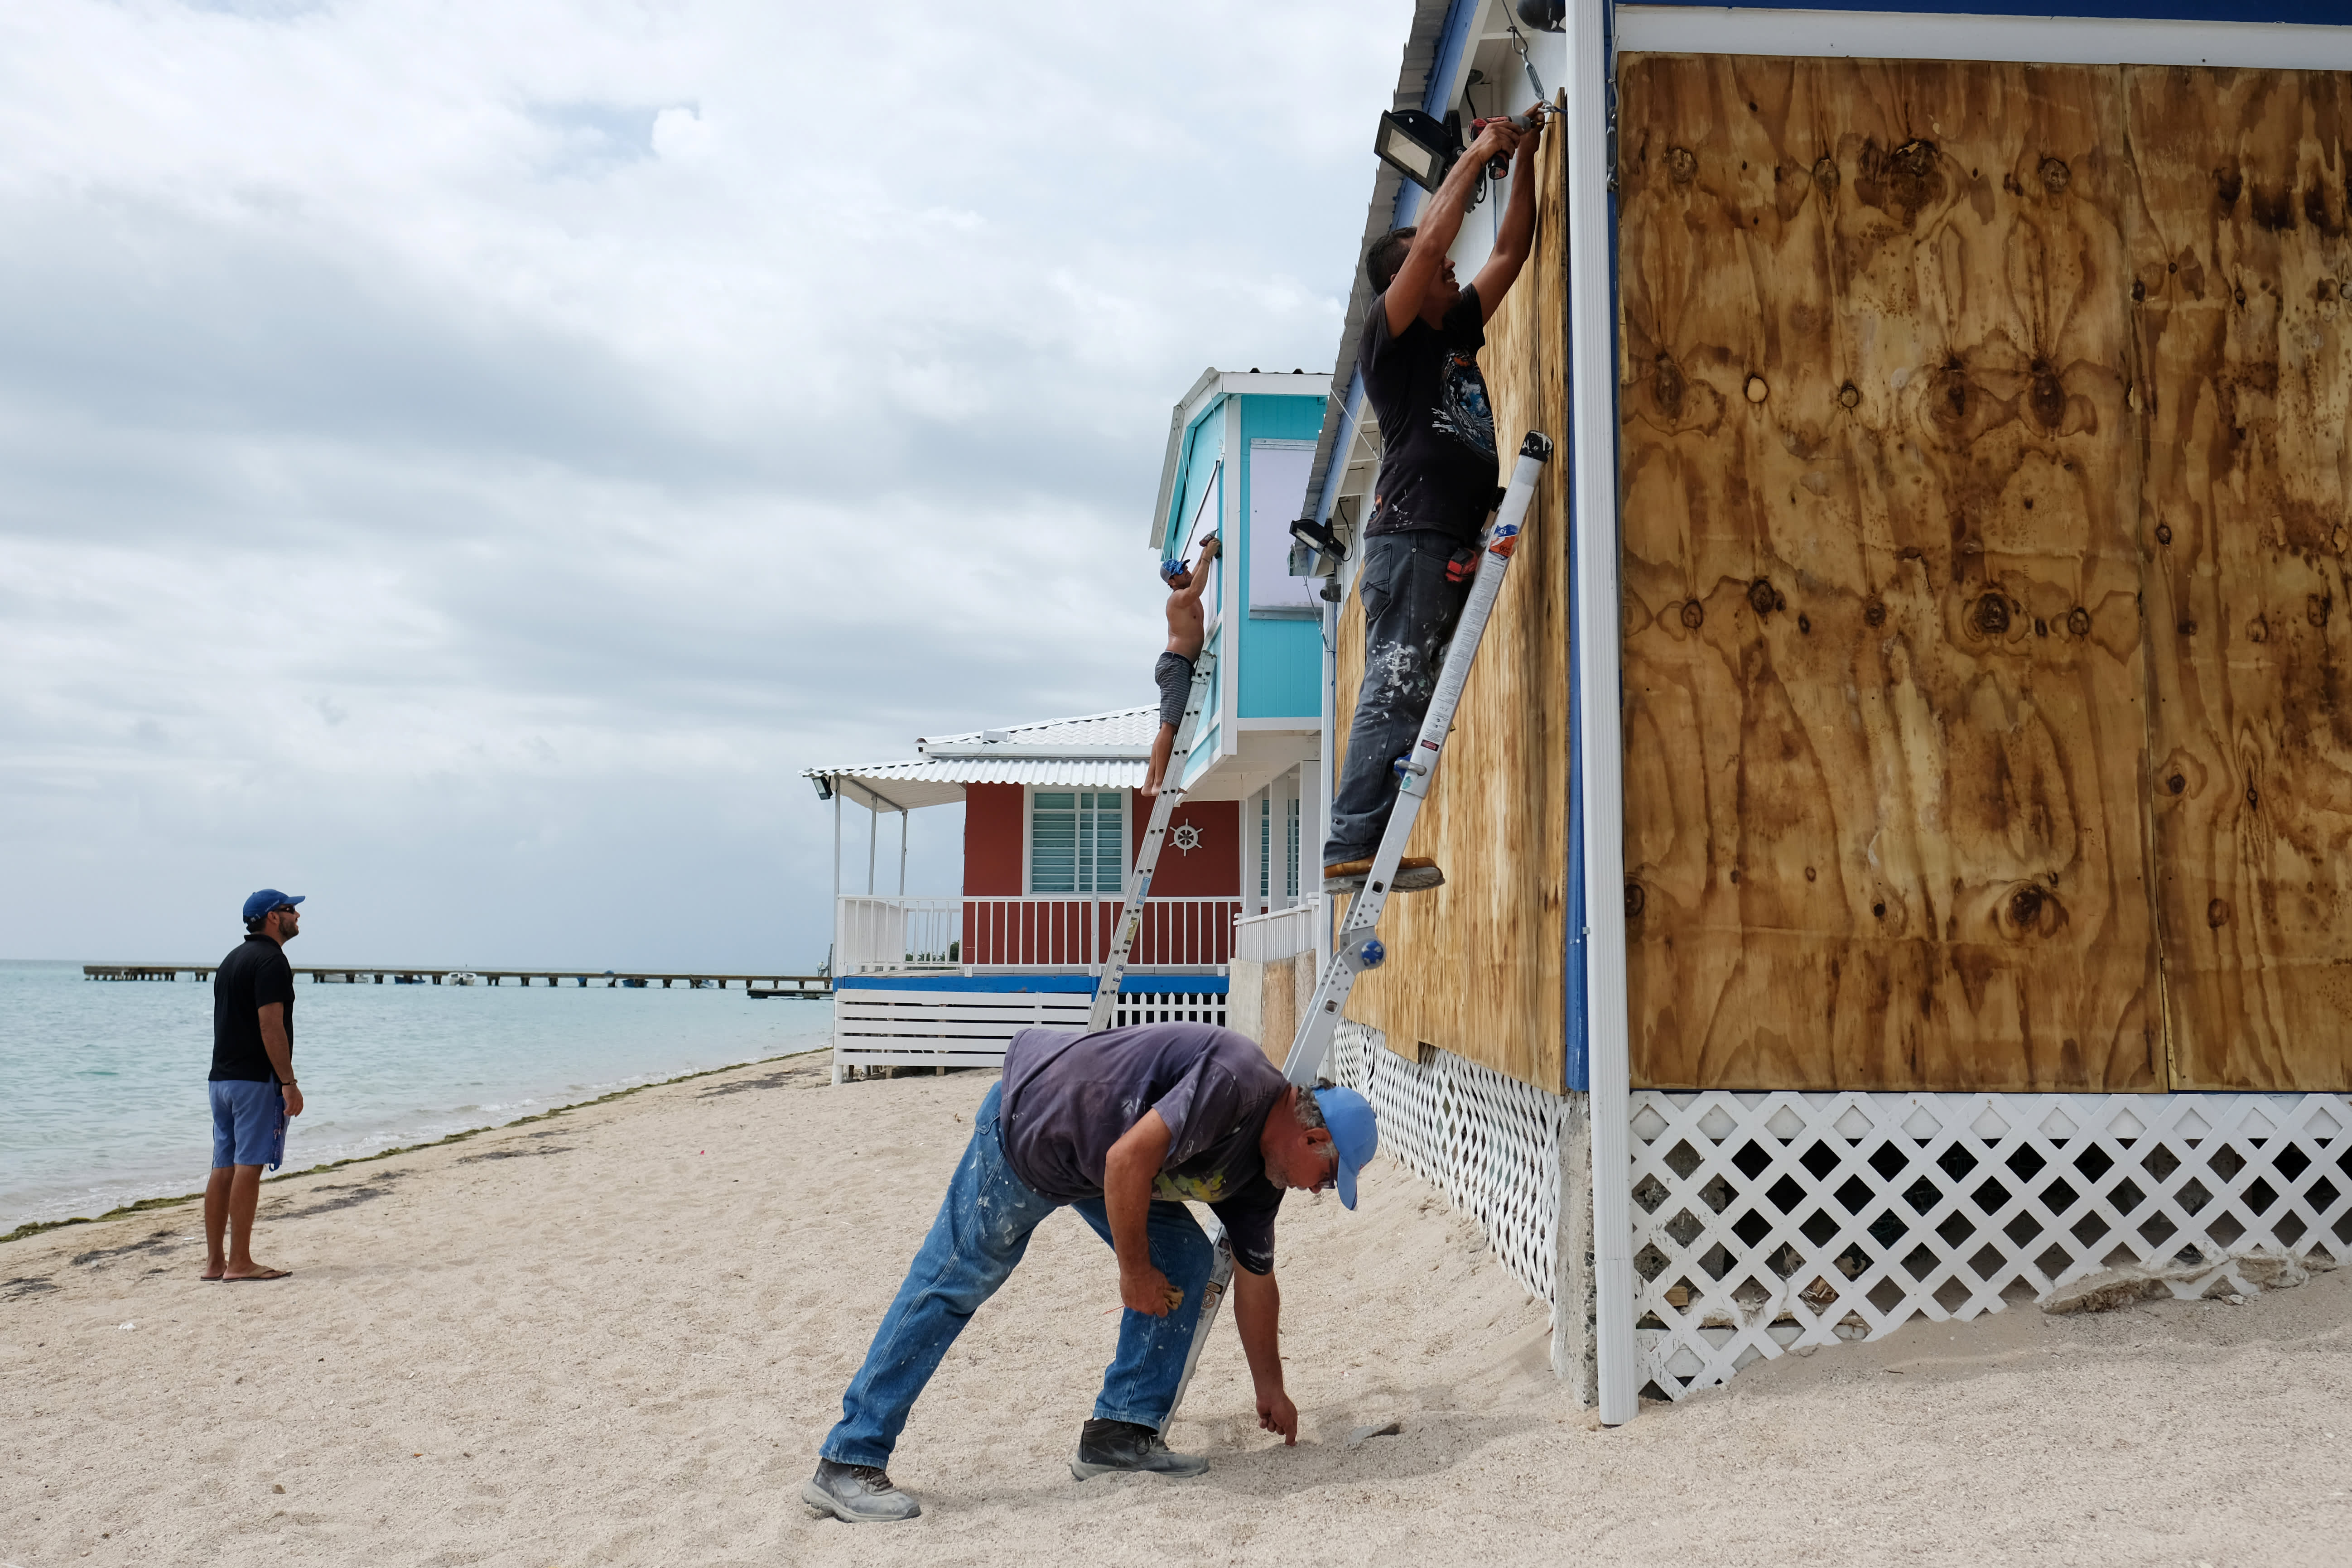 Trump unloads on 'corrupt' Puerto Rico as Tropical Storm Dorian threatens island — San Juan mayor tells him to 'calm down'